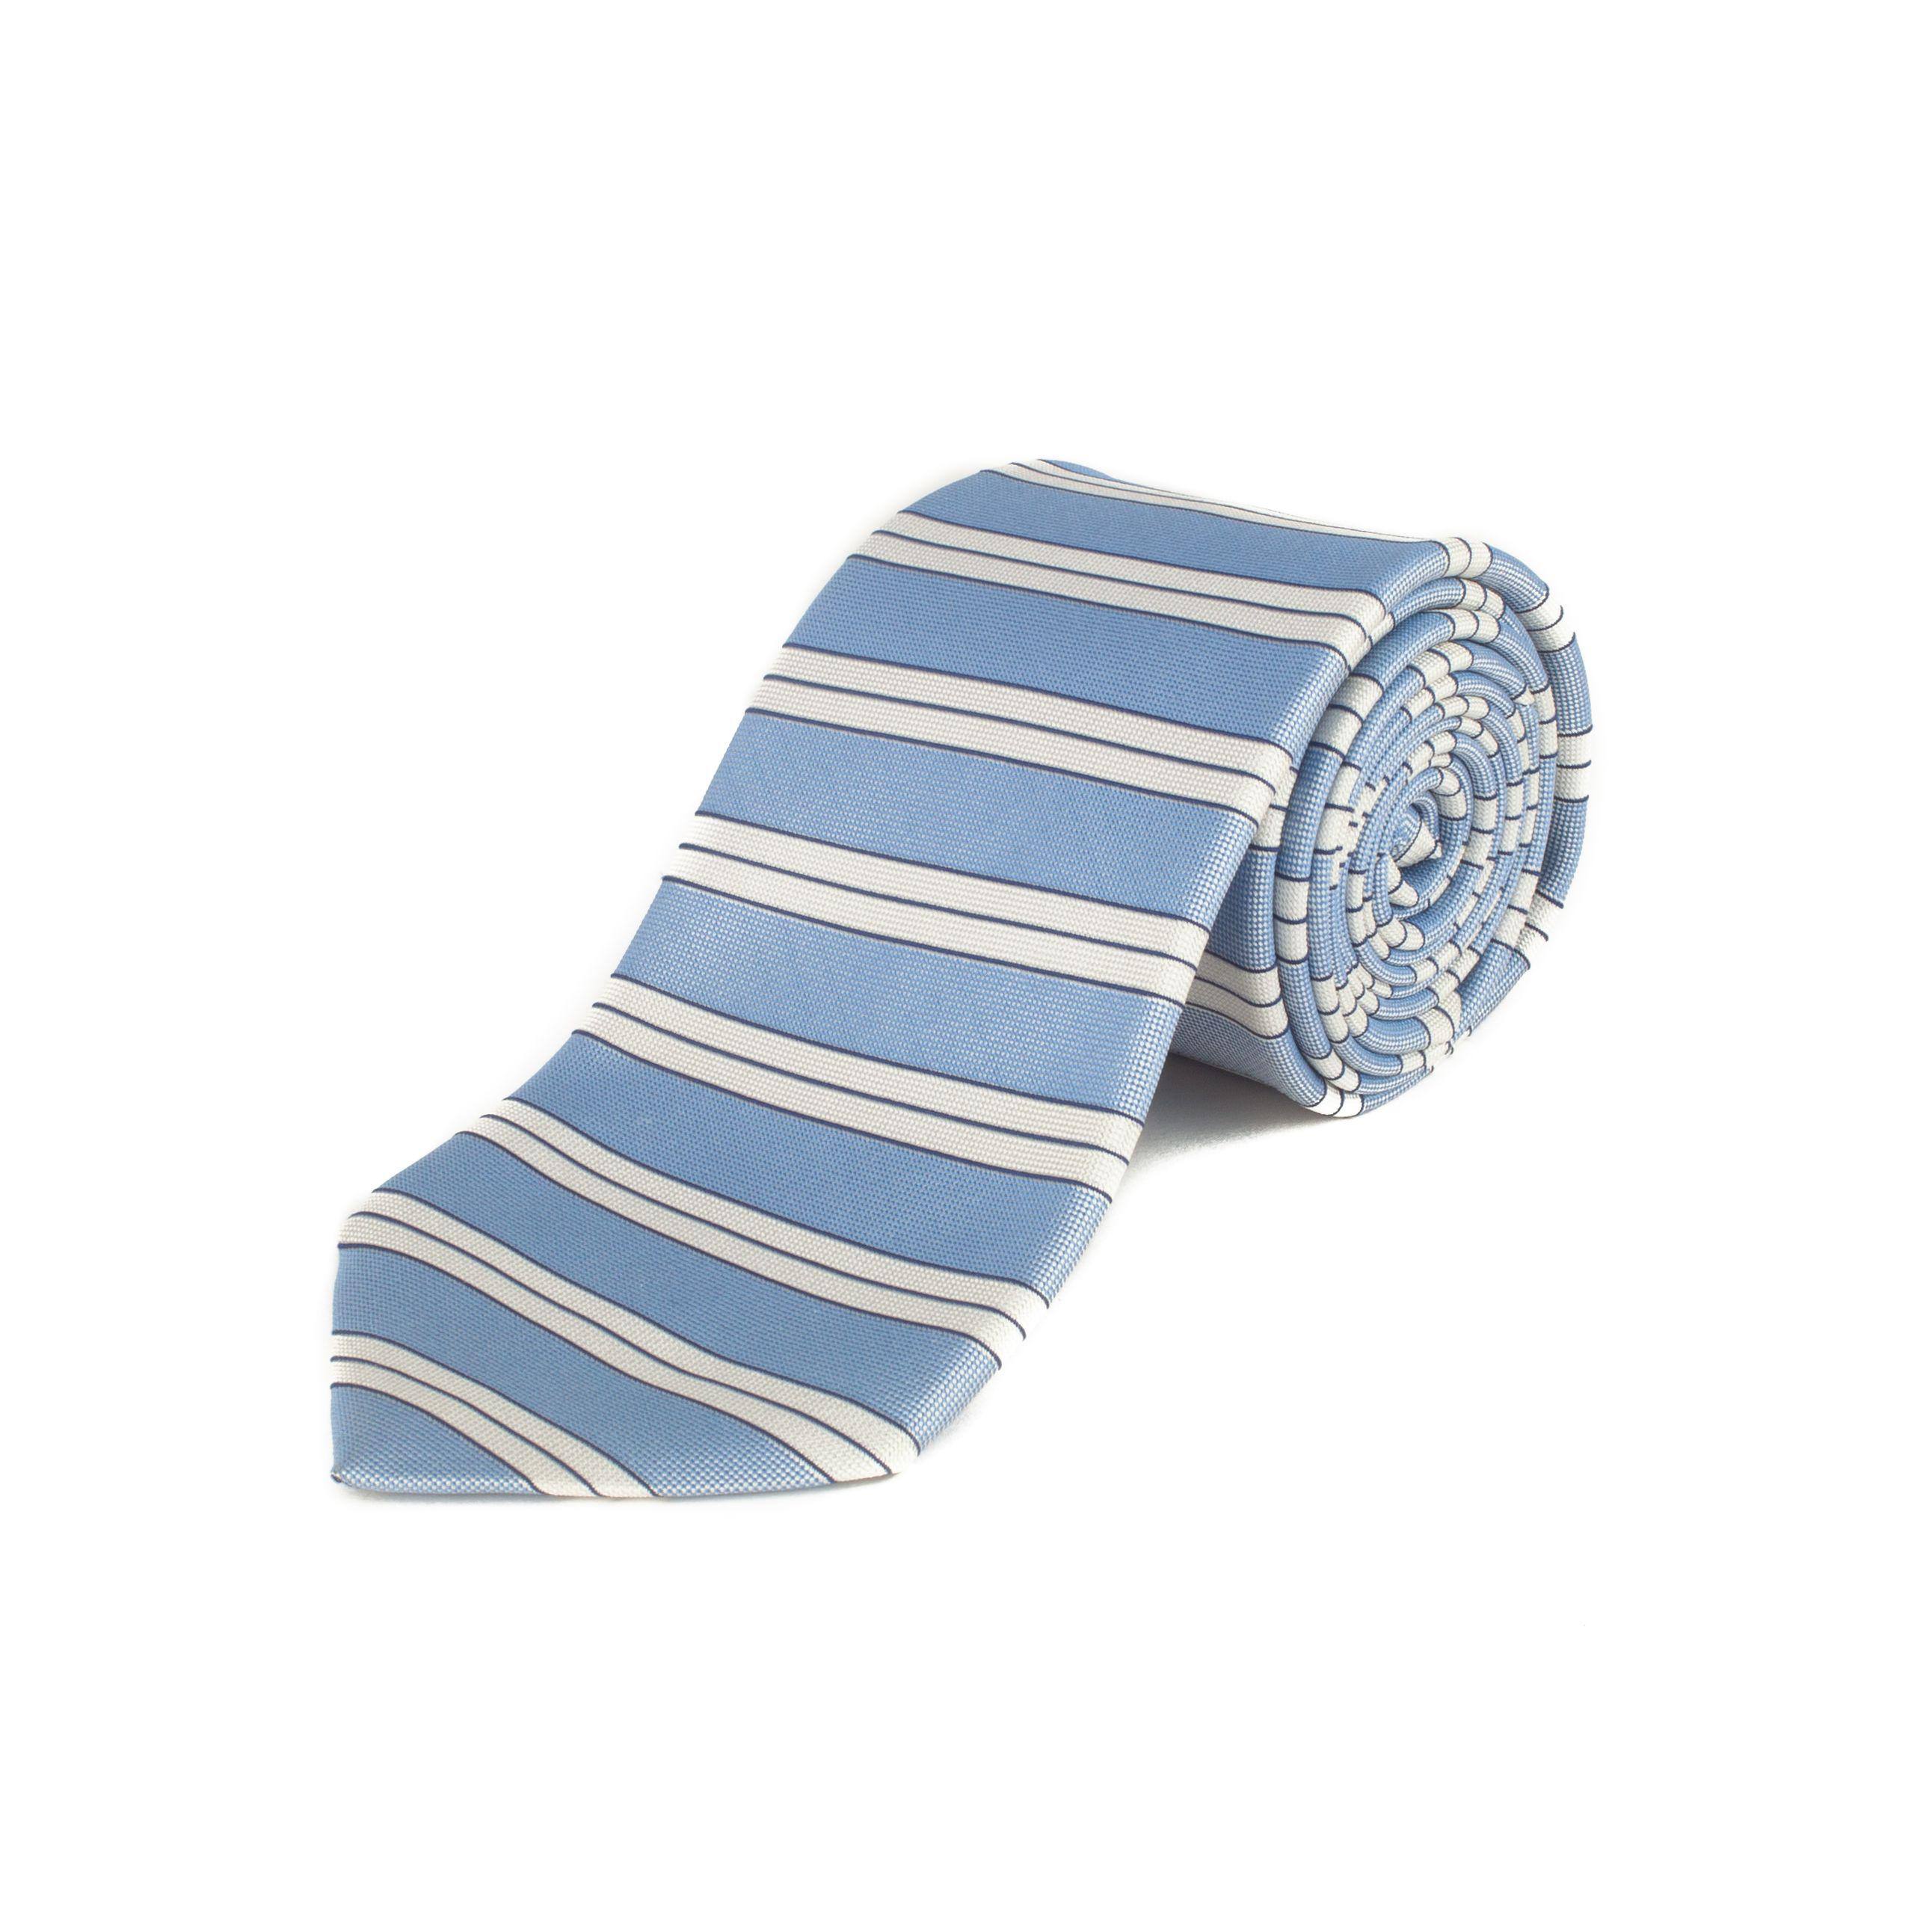 9886d69c Lyst - Ermenegildo Zegna Men's Silk Striped Tie Light Blue in Blue ...